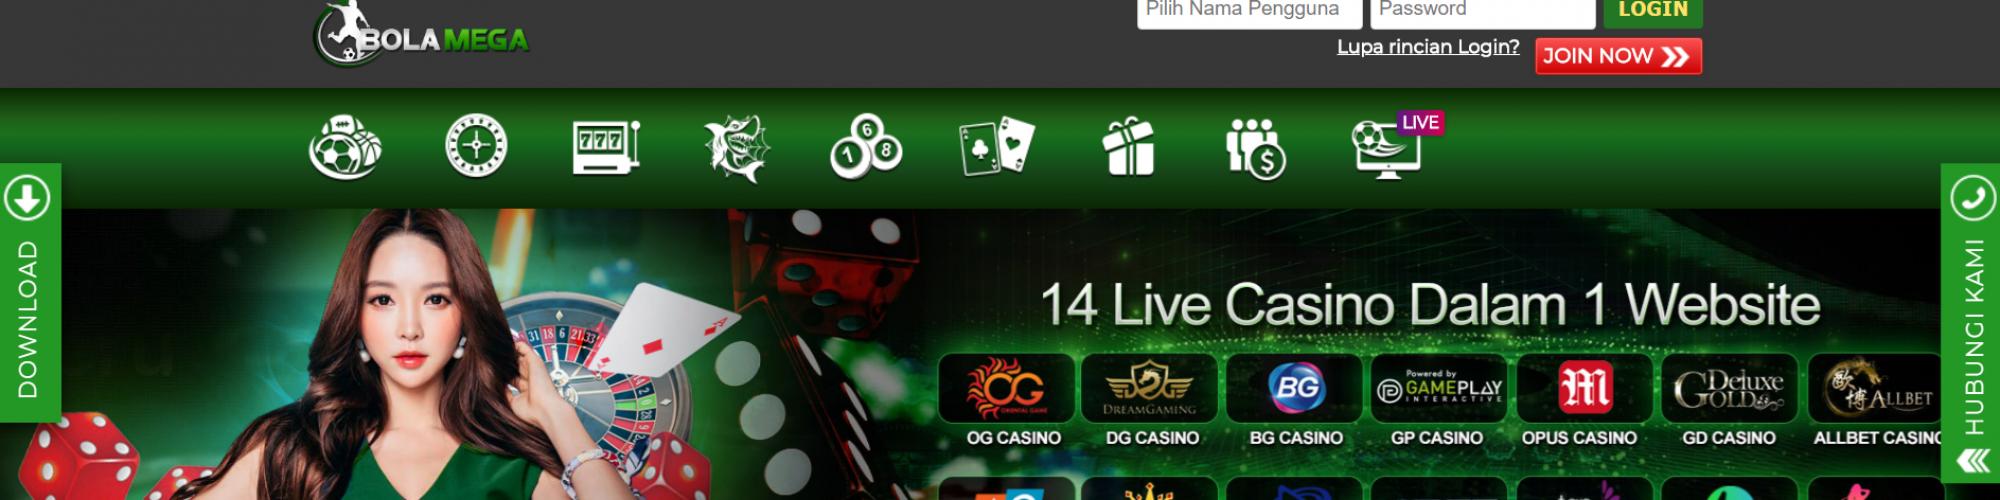 Agen Judi Casino Online Terbaik Startus